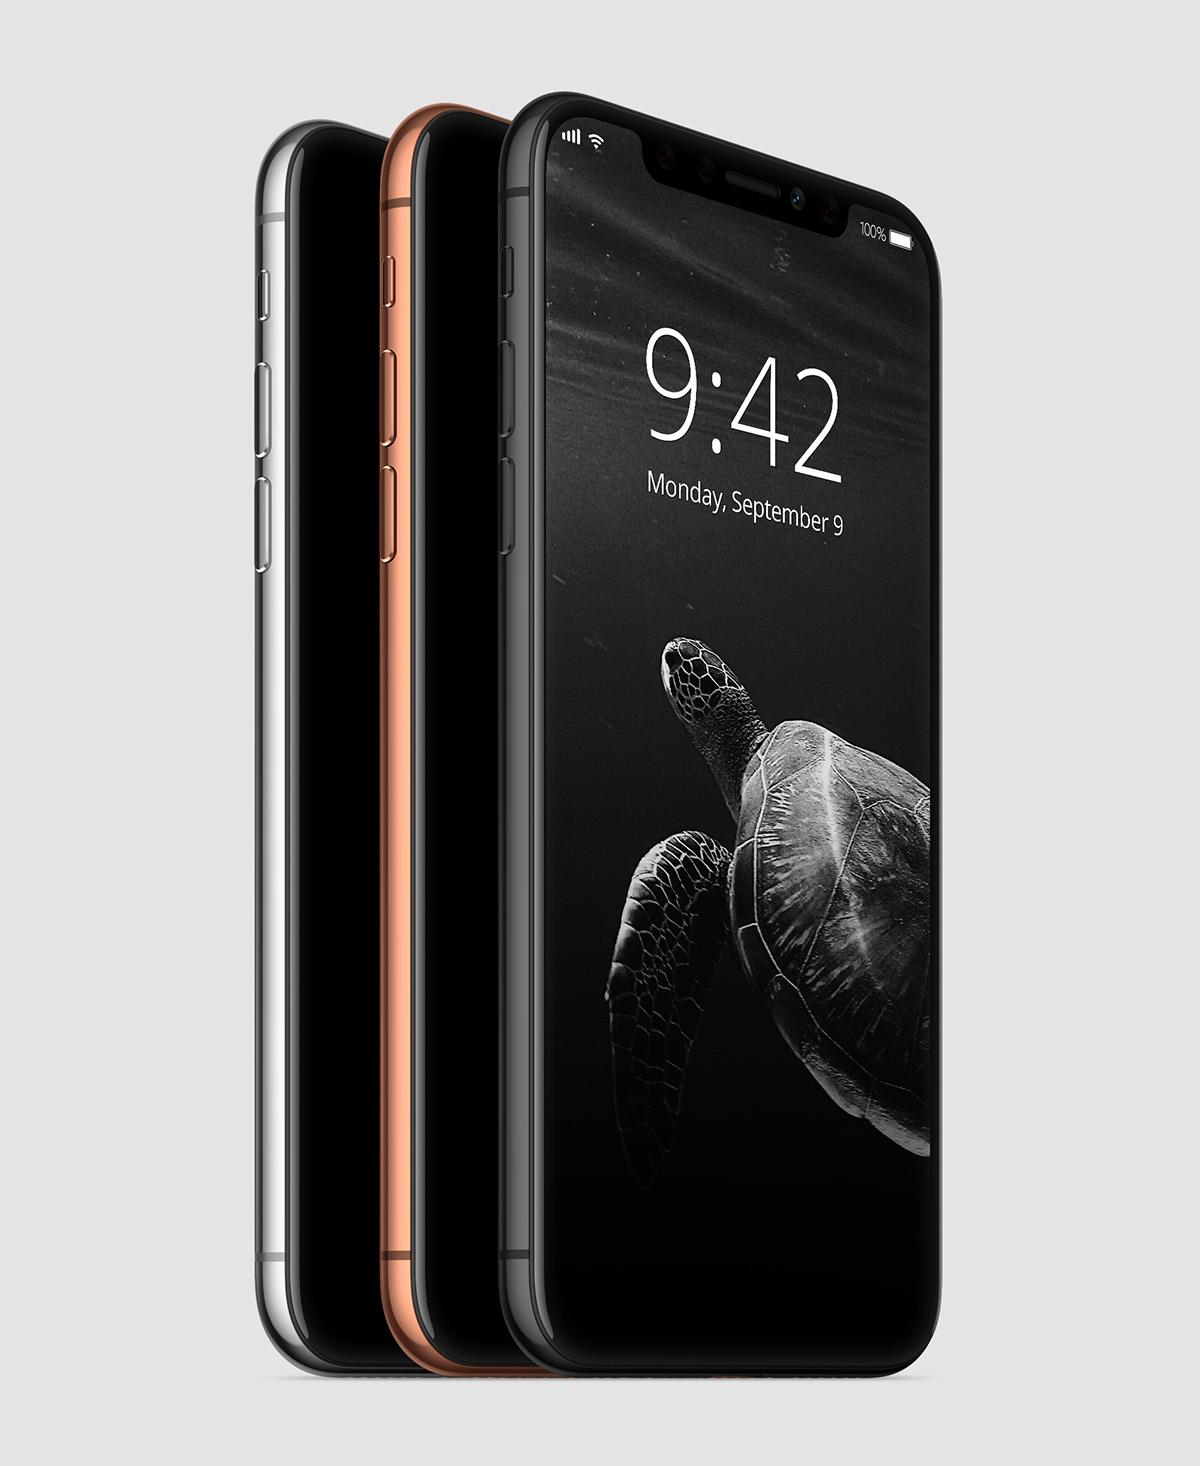 iPhone8、8 Plus SIMフリー版購入ガイド ドコモ、au、ソフトバンク、AppleStoreどこがお得?